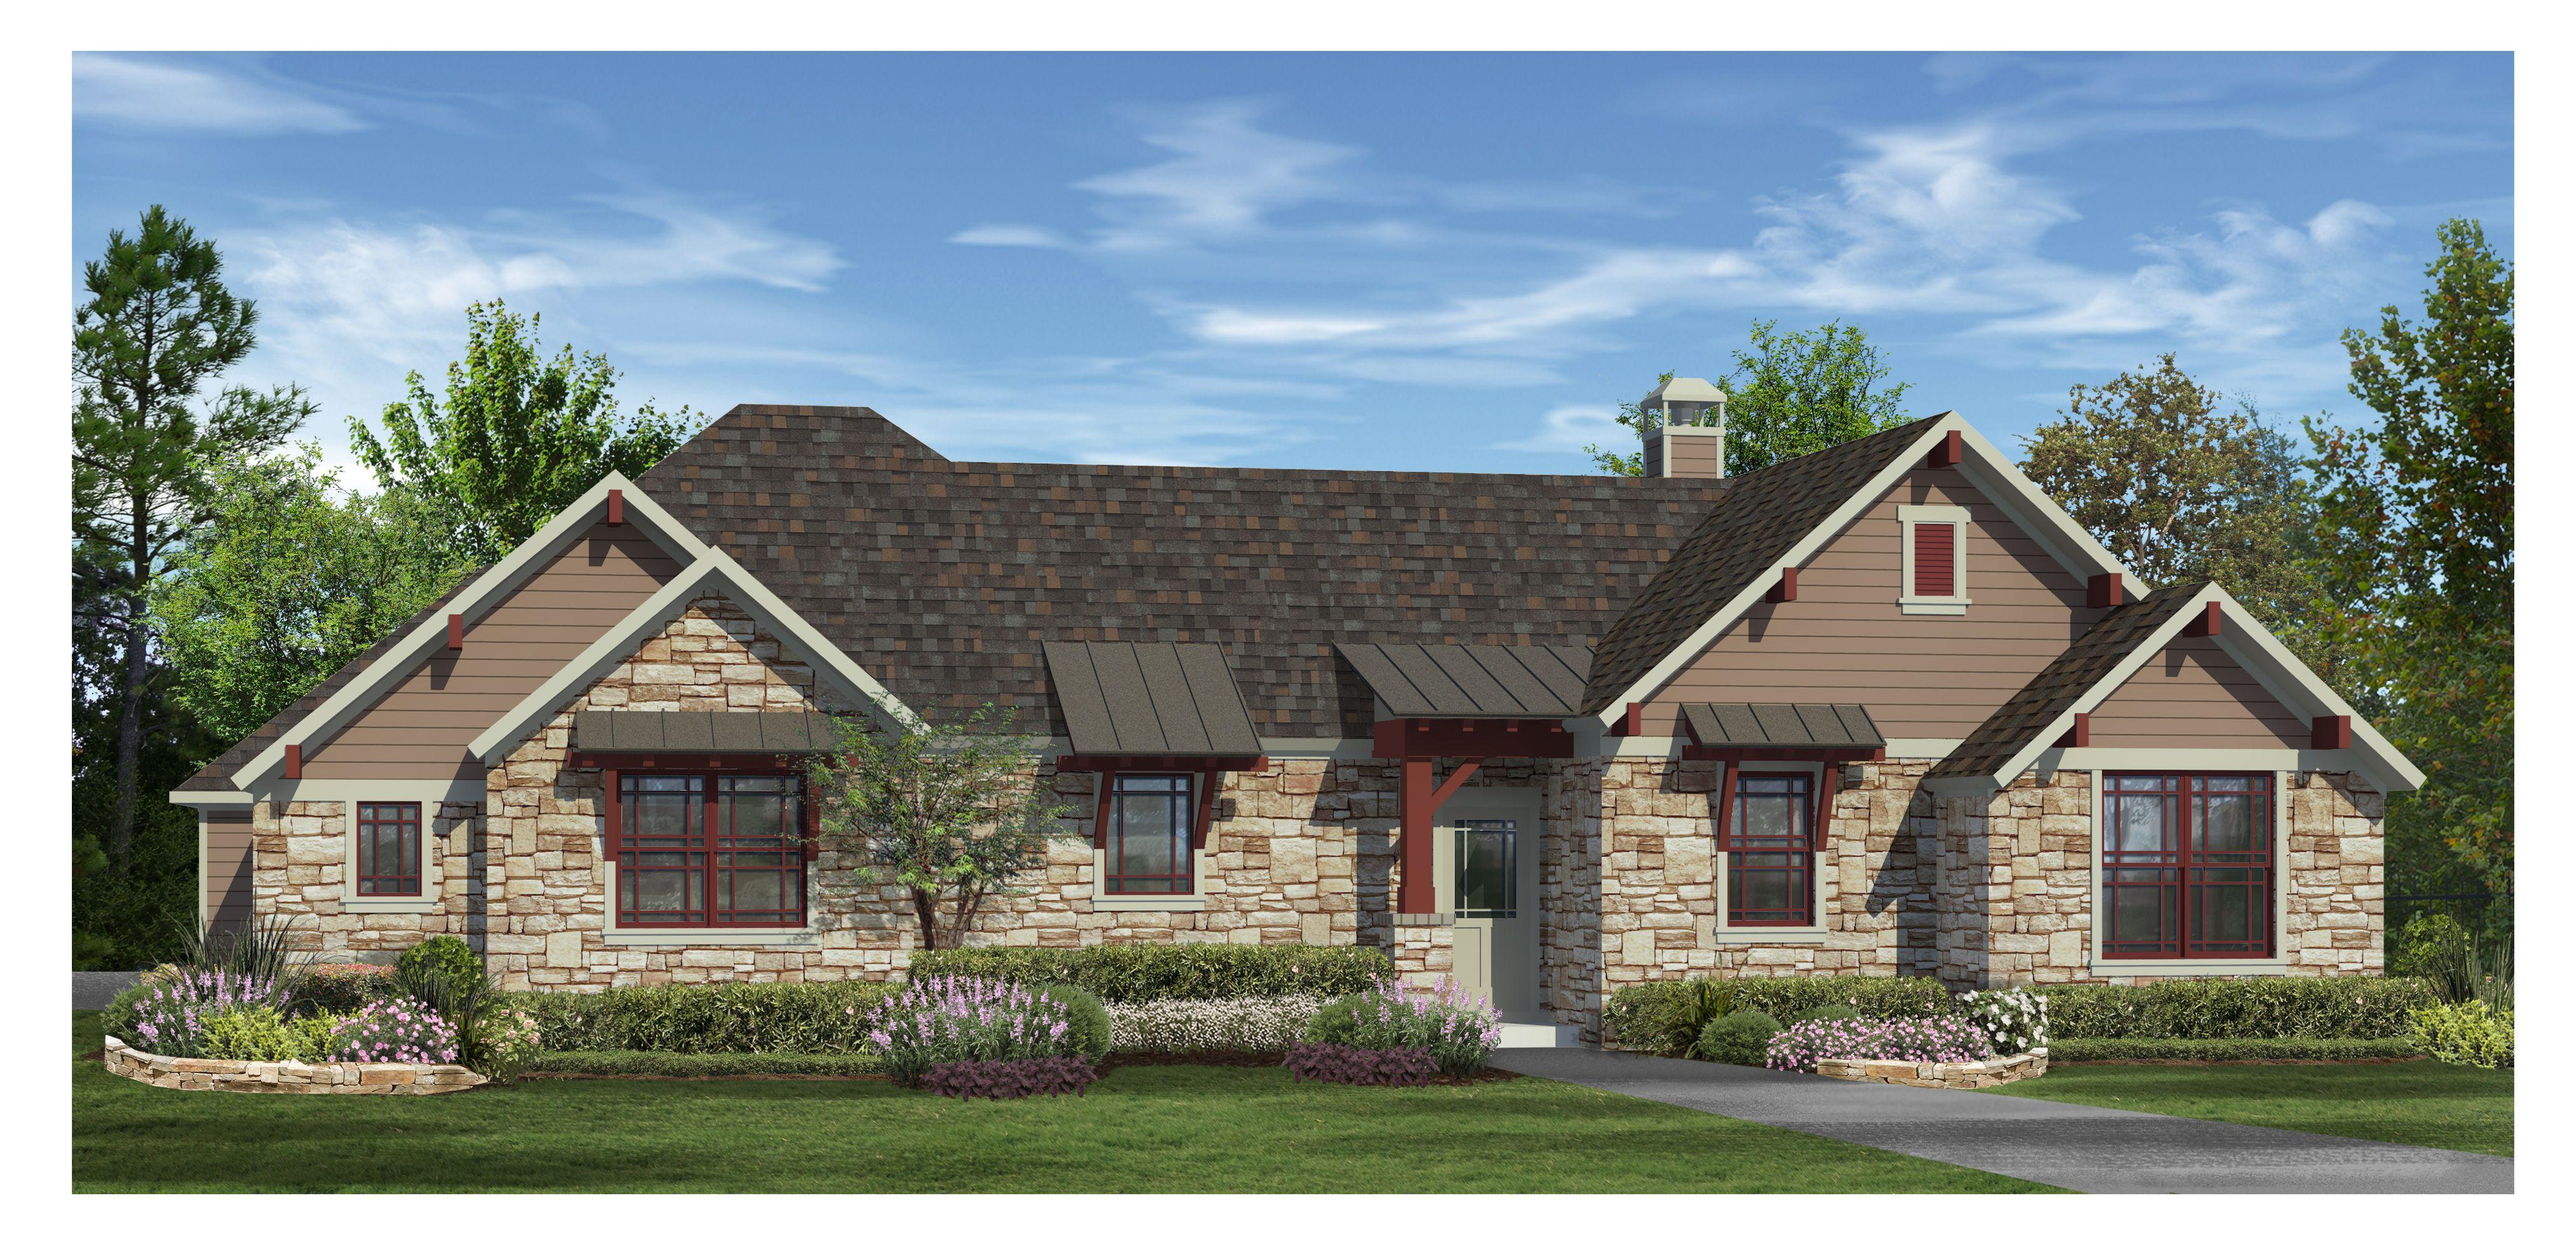 The Valencia   Plus Sq Ft Custom Home Plans Design Tech Homes - Design tech homes pricing